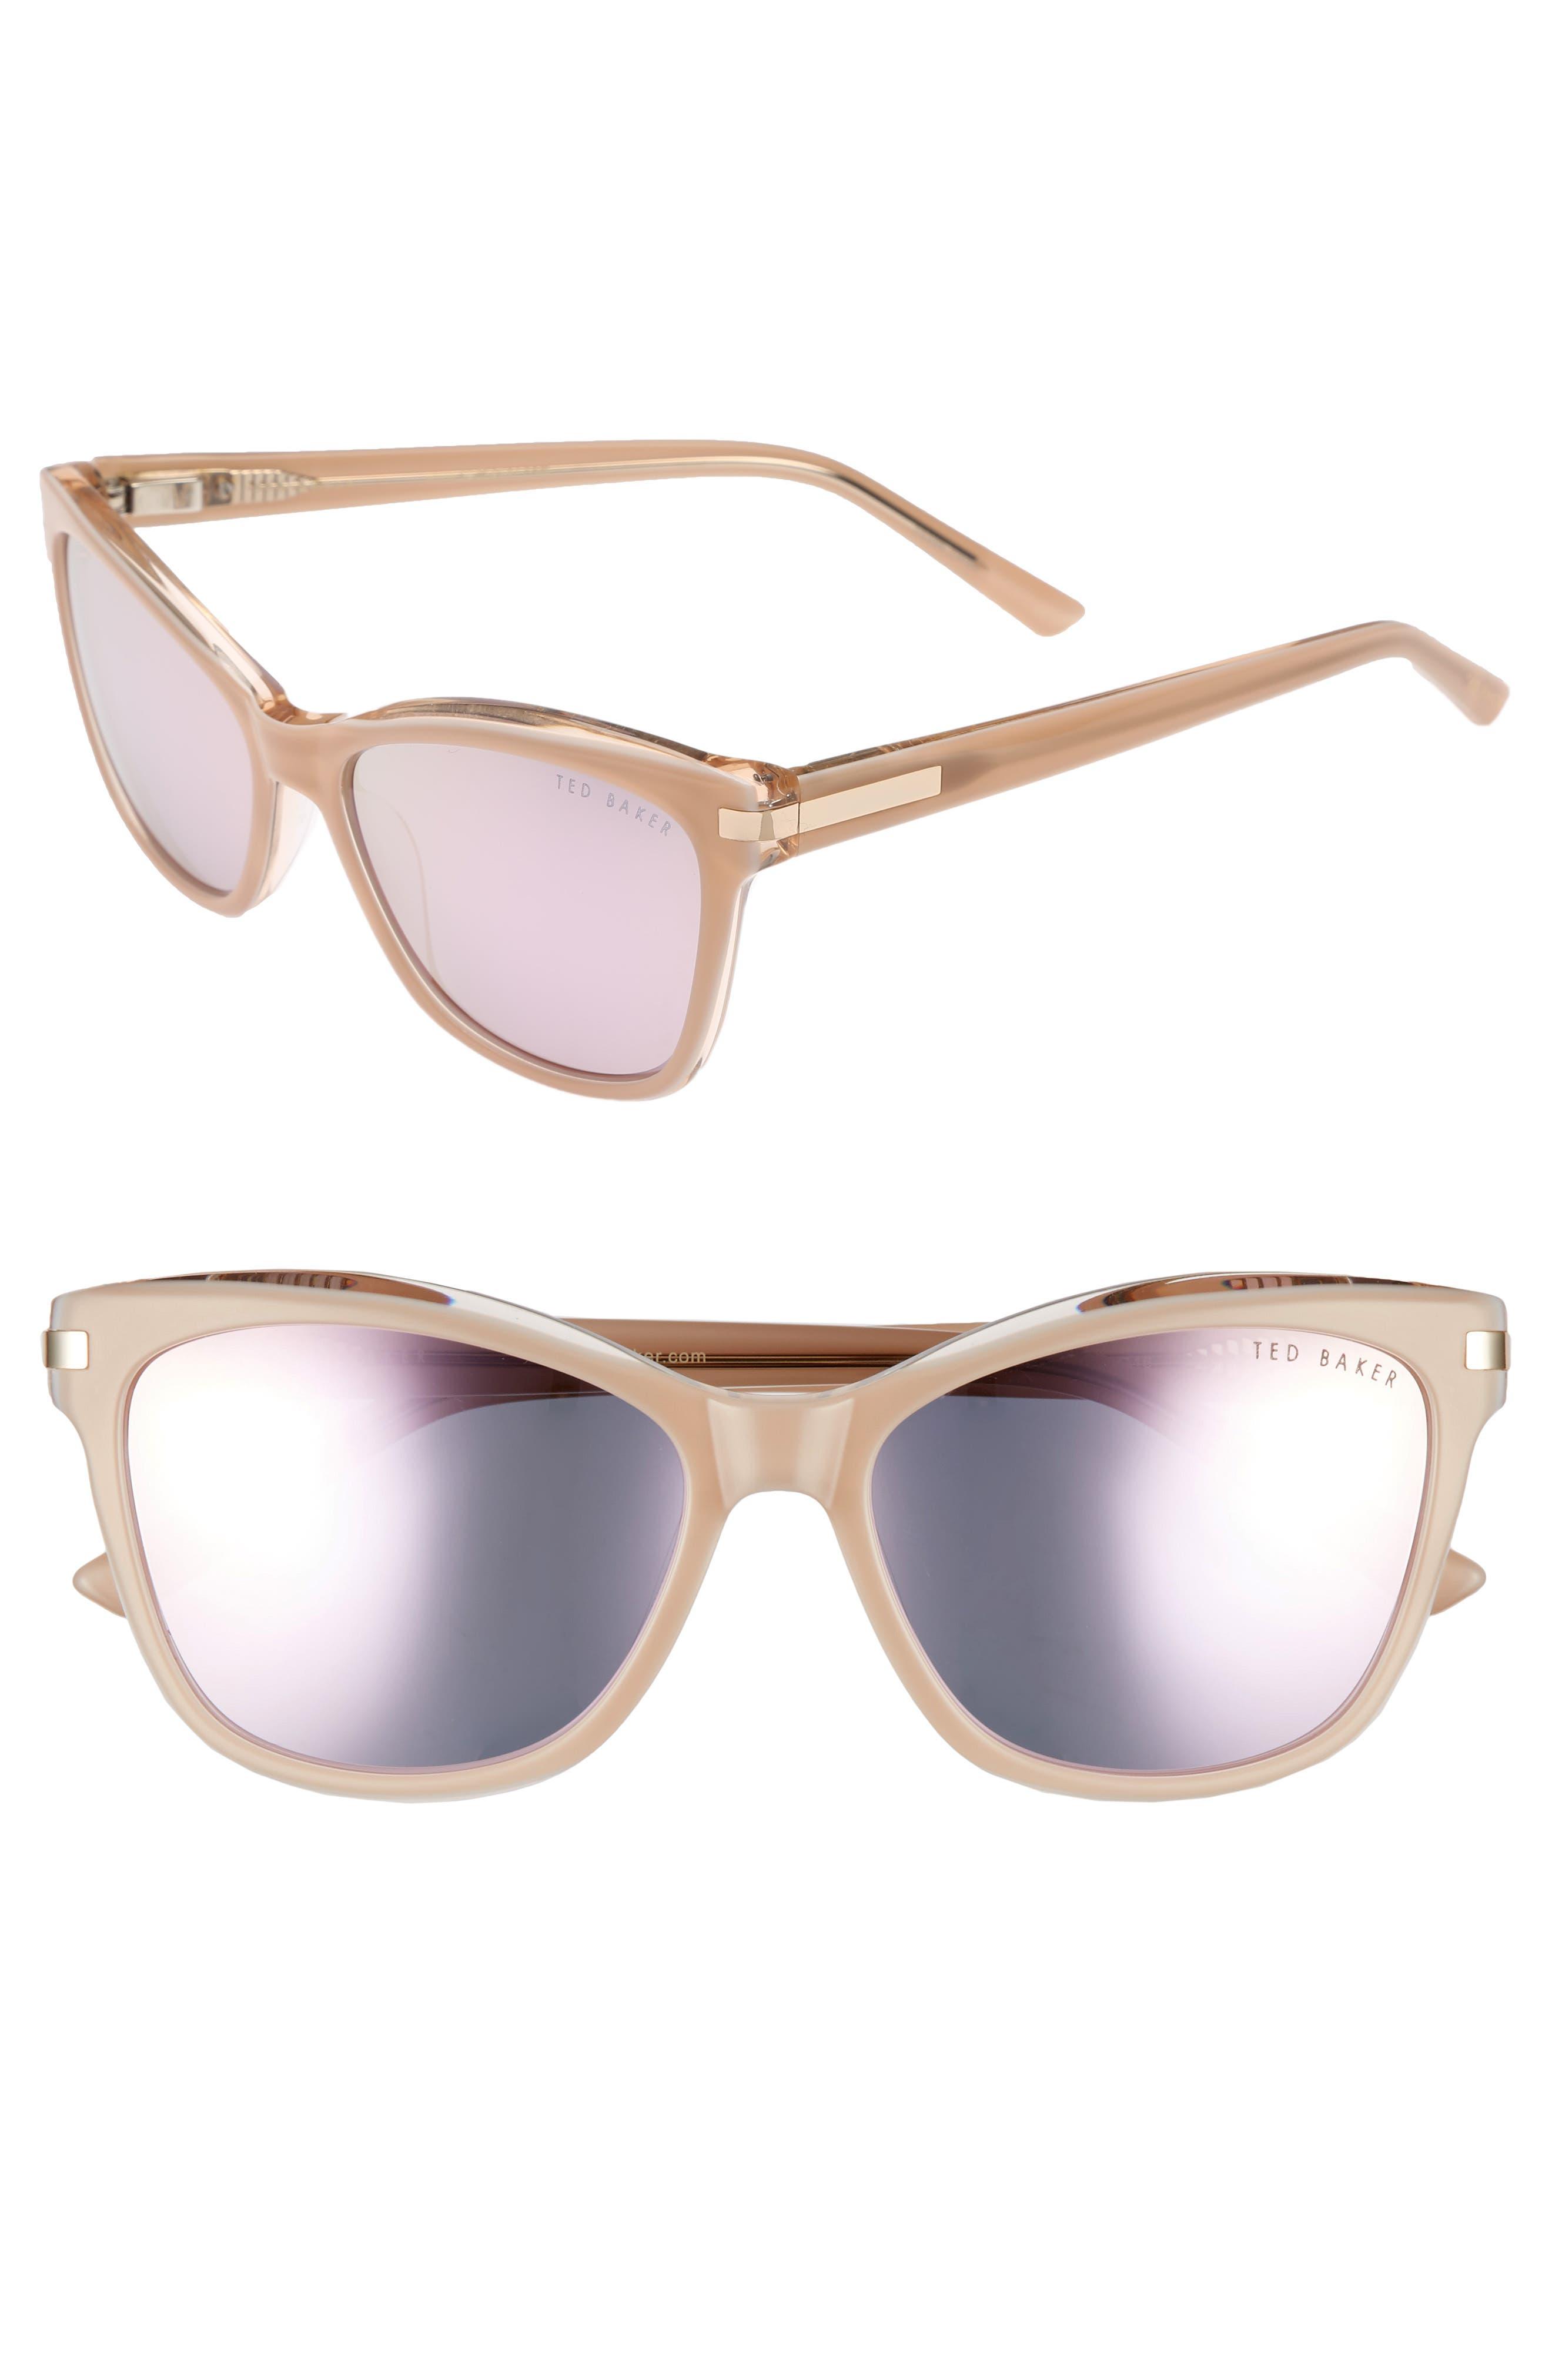 56mm Cat Eye Sunglasses,                         Main,                         color, BLUSH